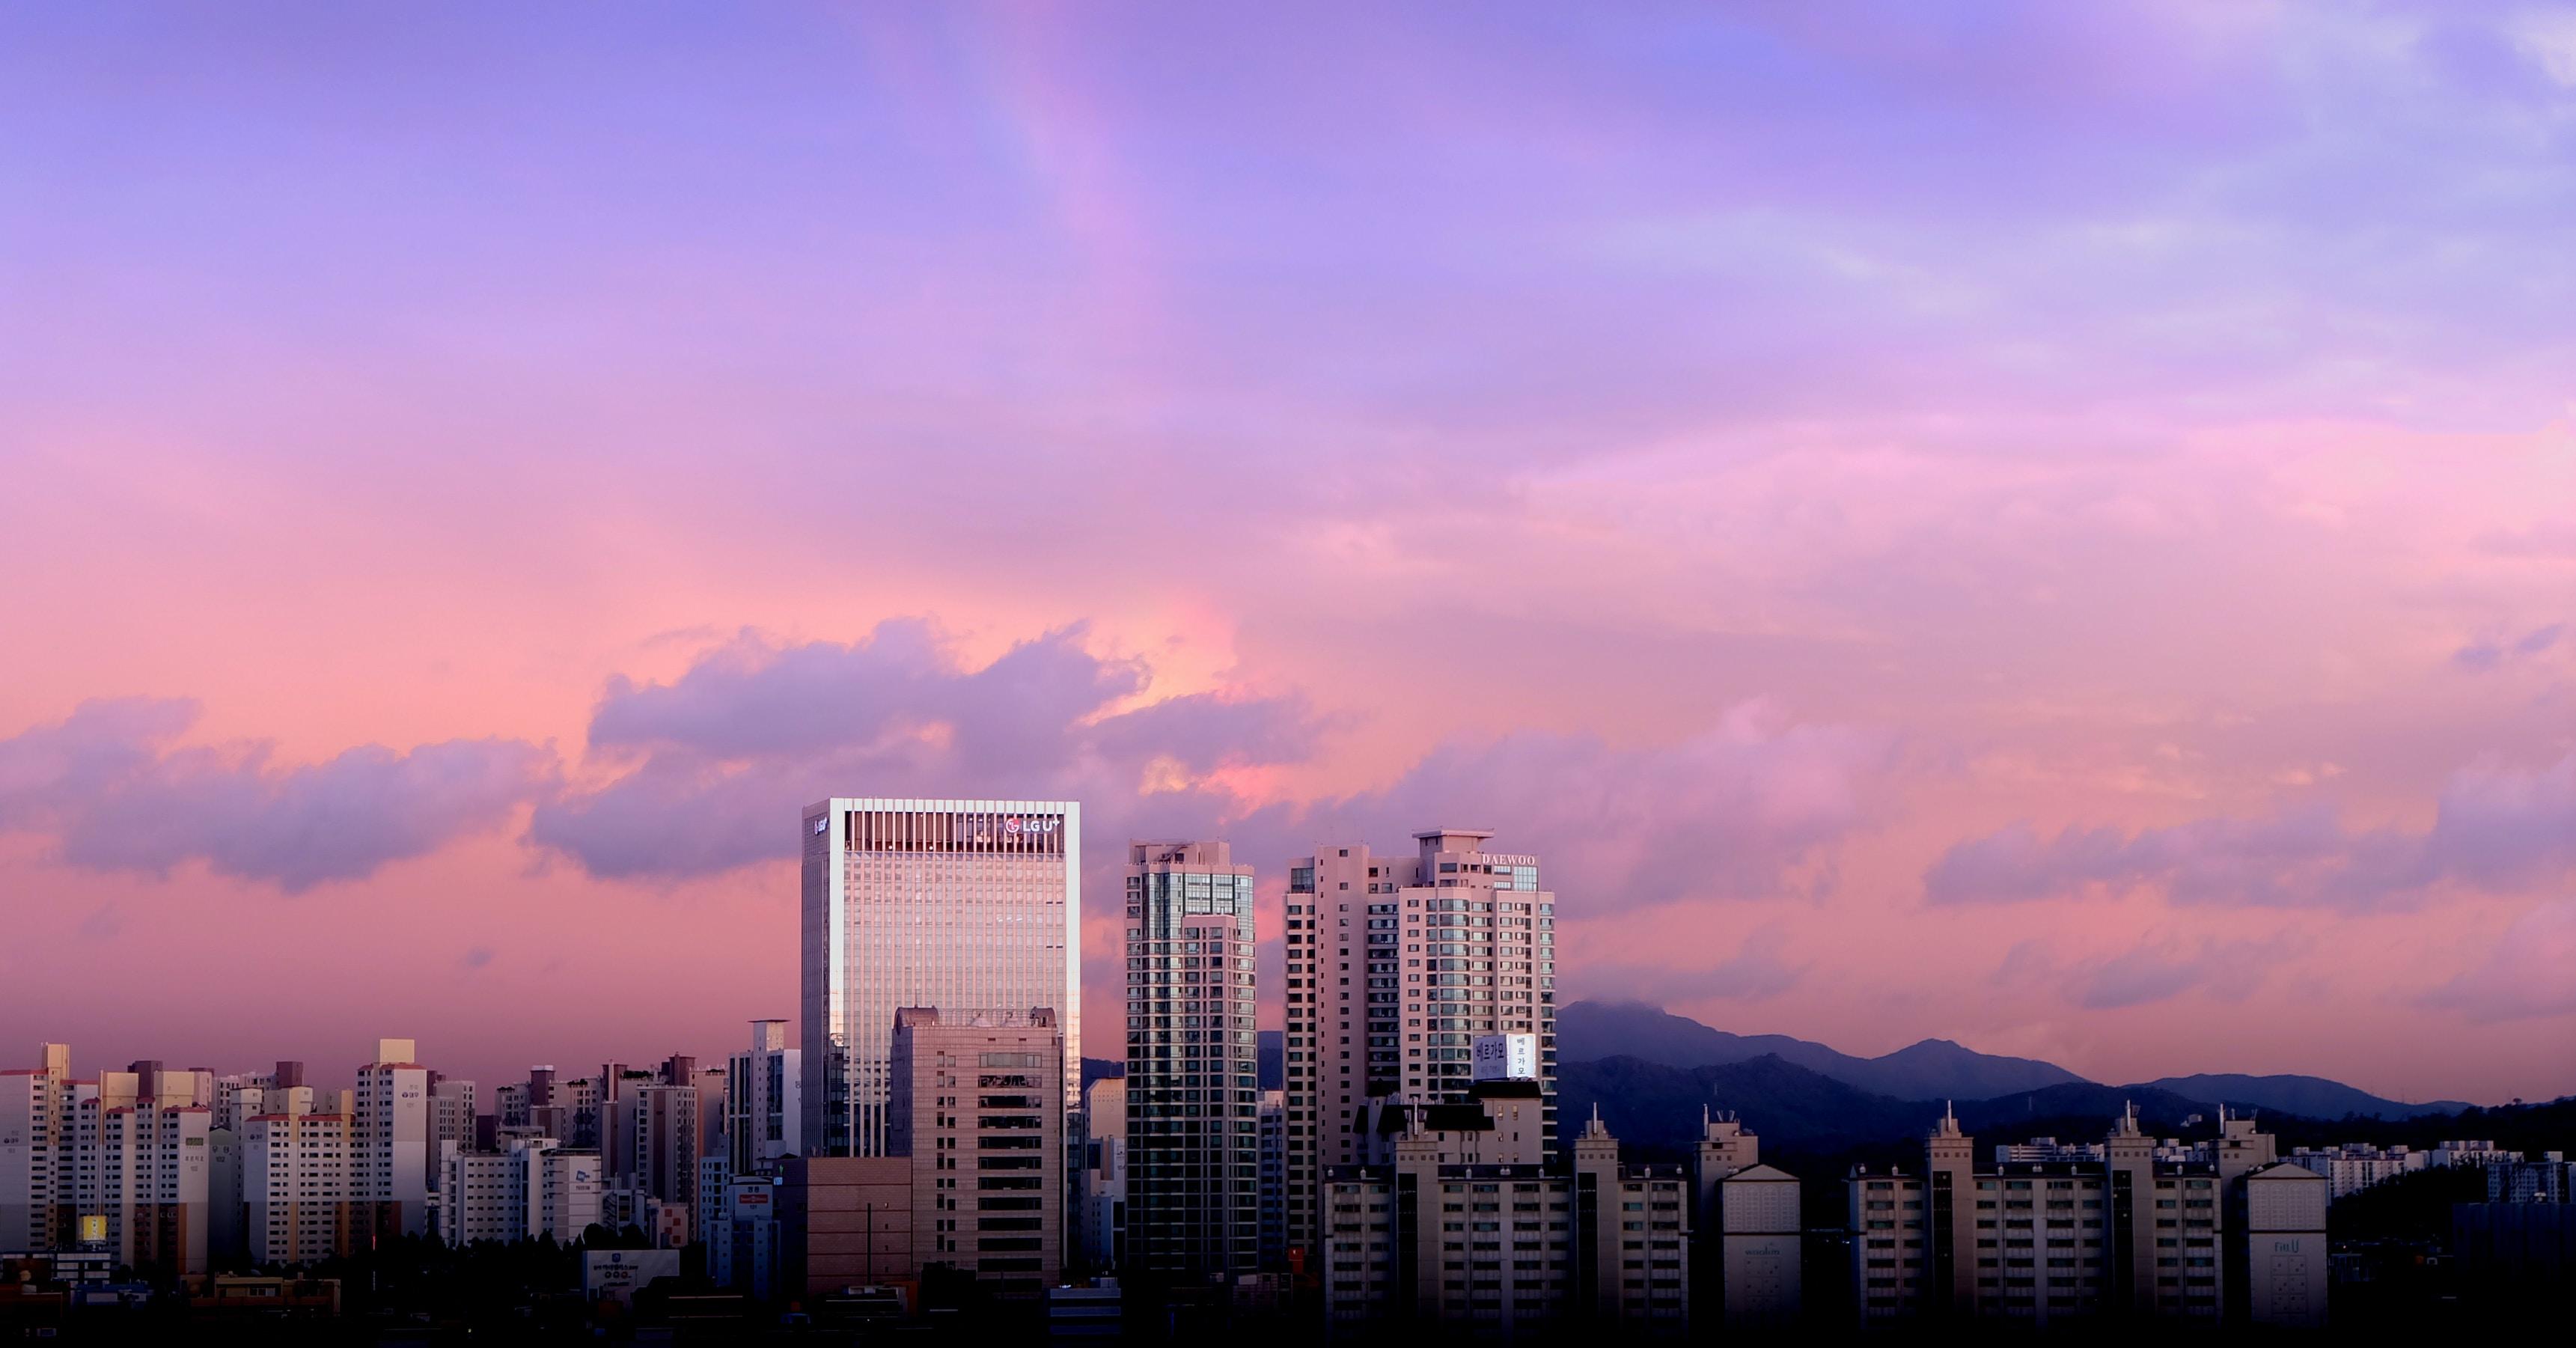 Pink and purple sunset over a metropolitan area